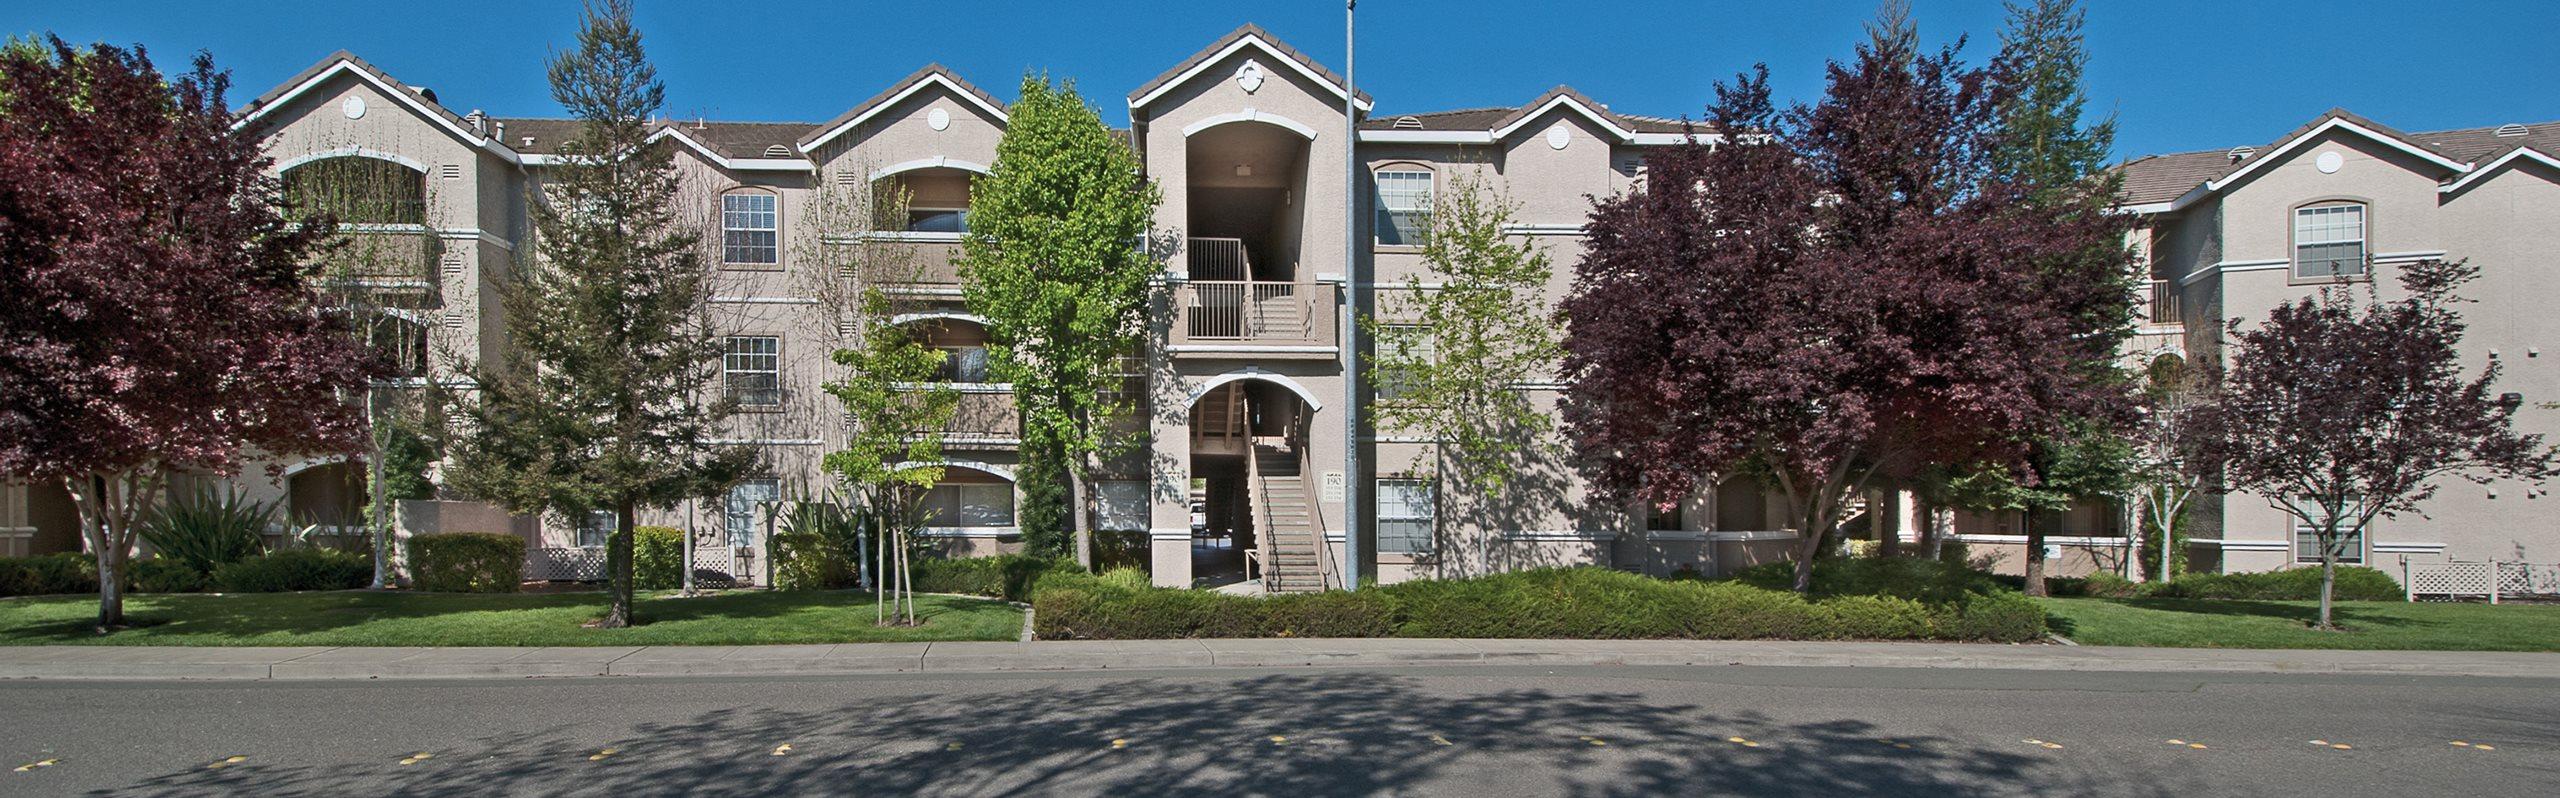 Mountain Shadows Apartments exterior view